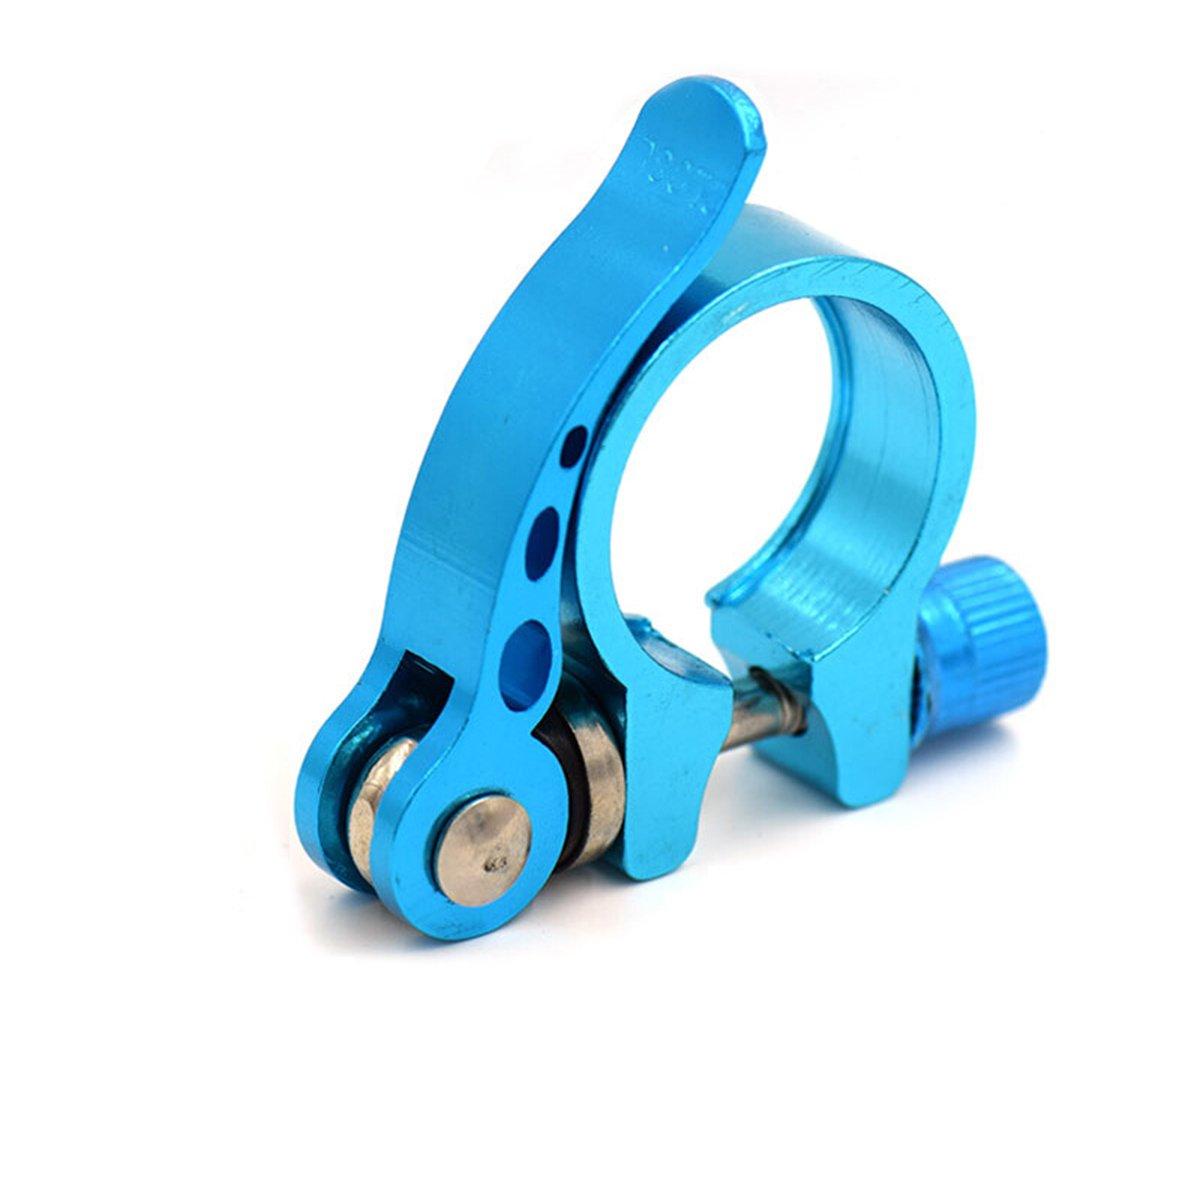 WINOMOアルミニウム合金サイクリングバイク自転車クイックリリースシートポストクランプ(ブルー) B073LSGD6W 28.6mm,Blue 28.6mm,Blue